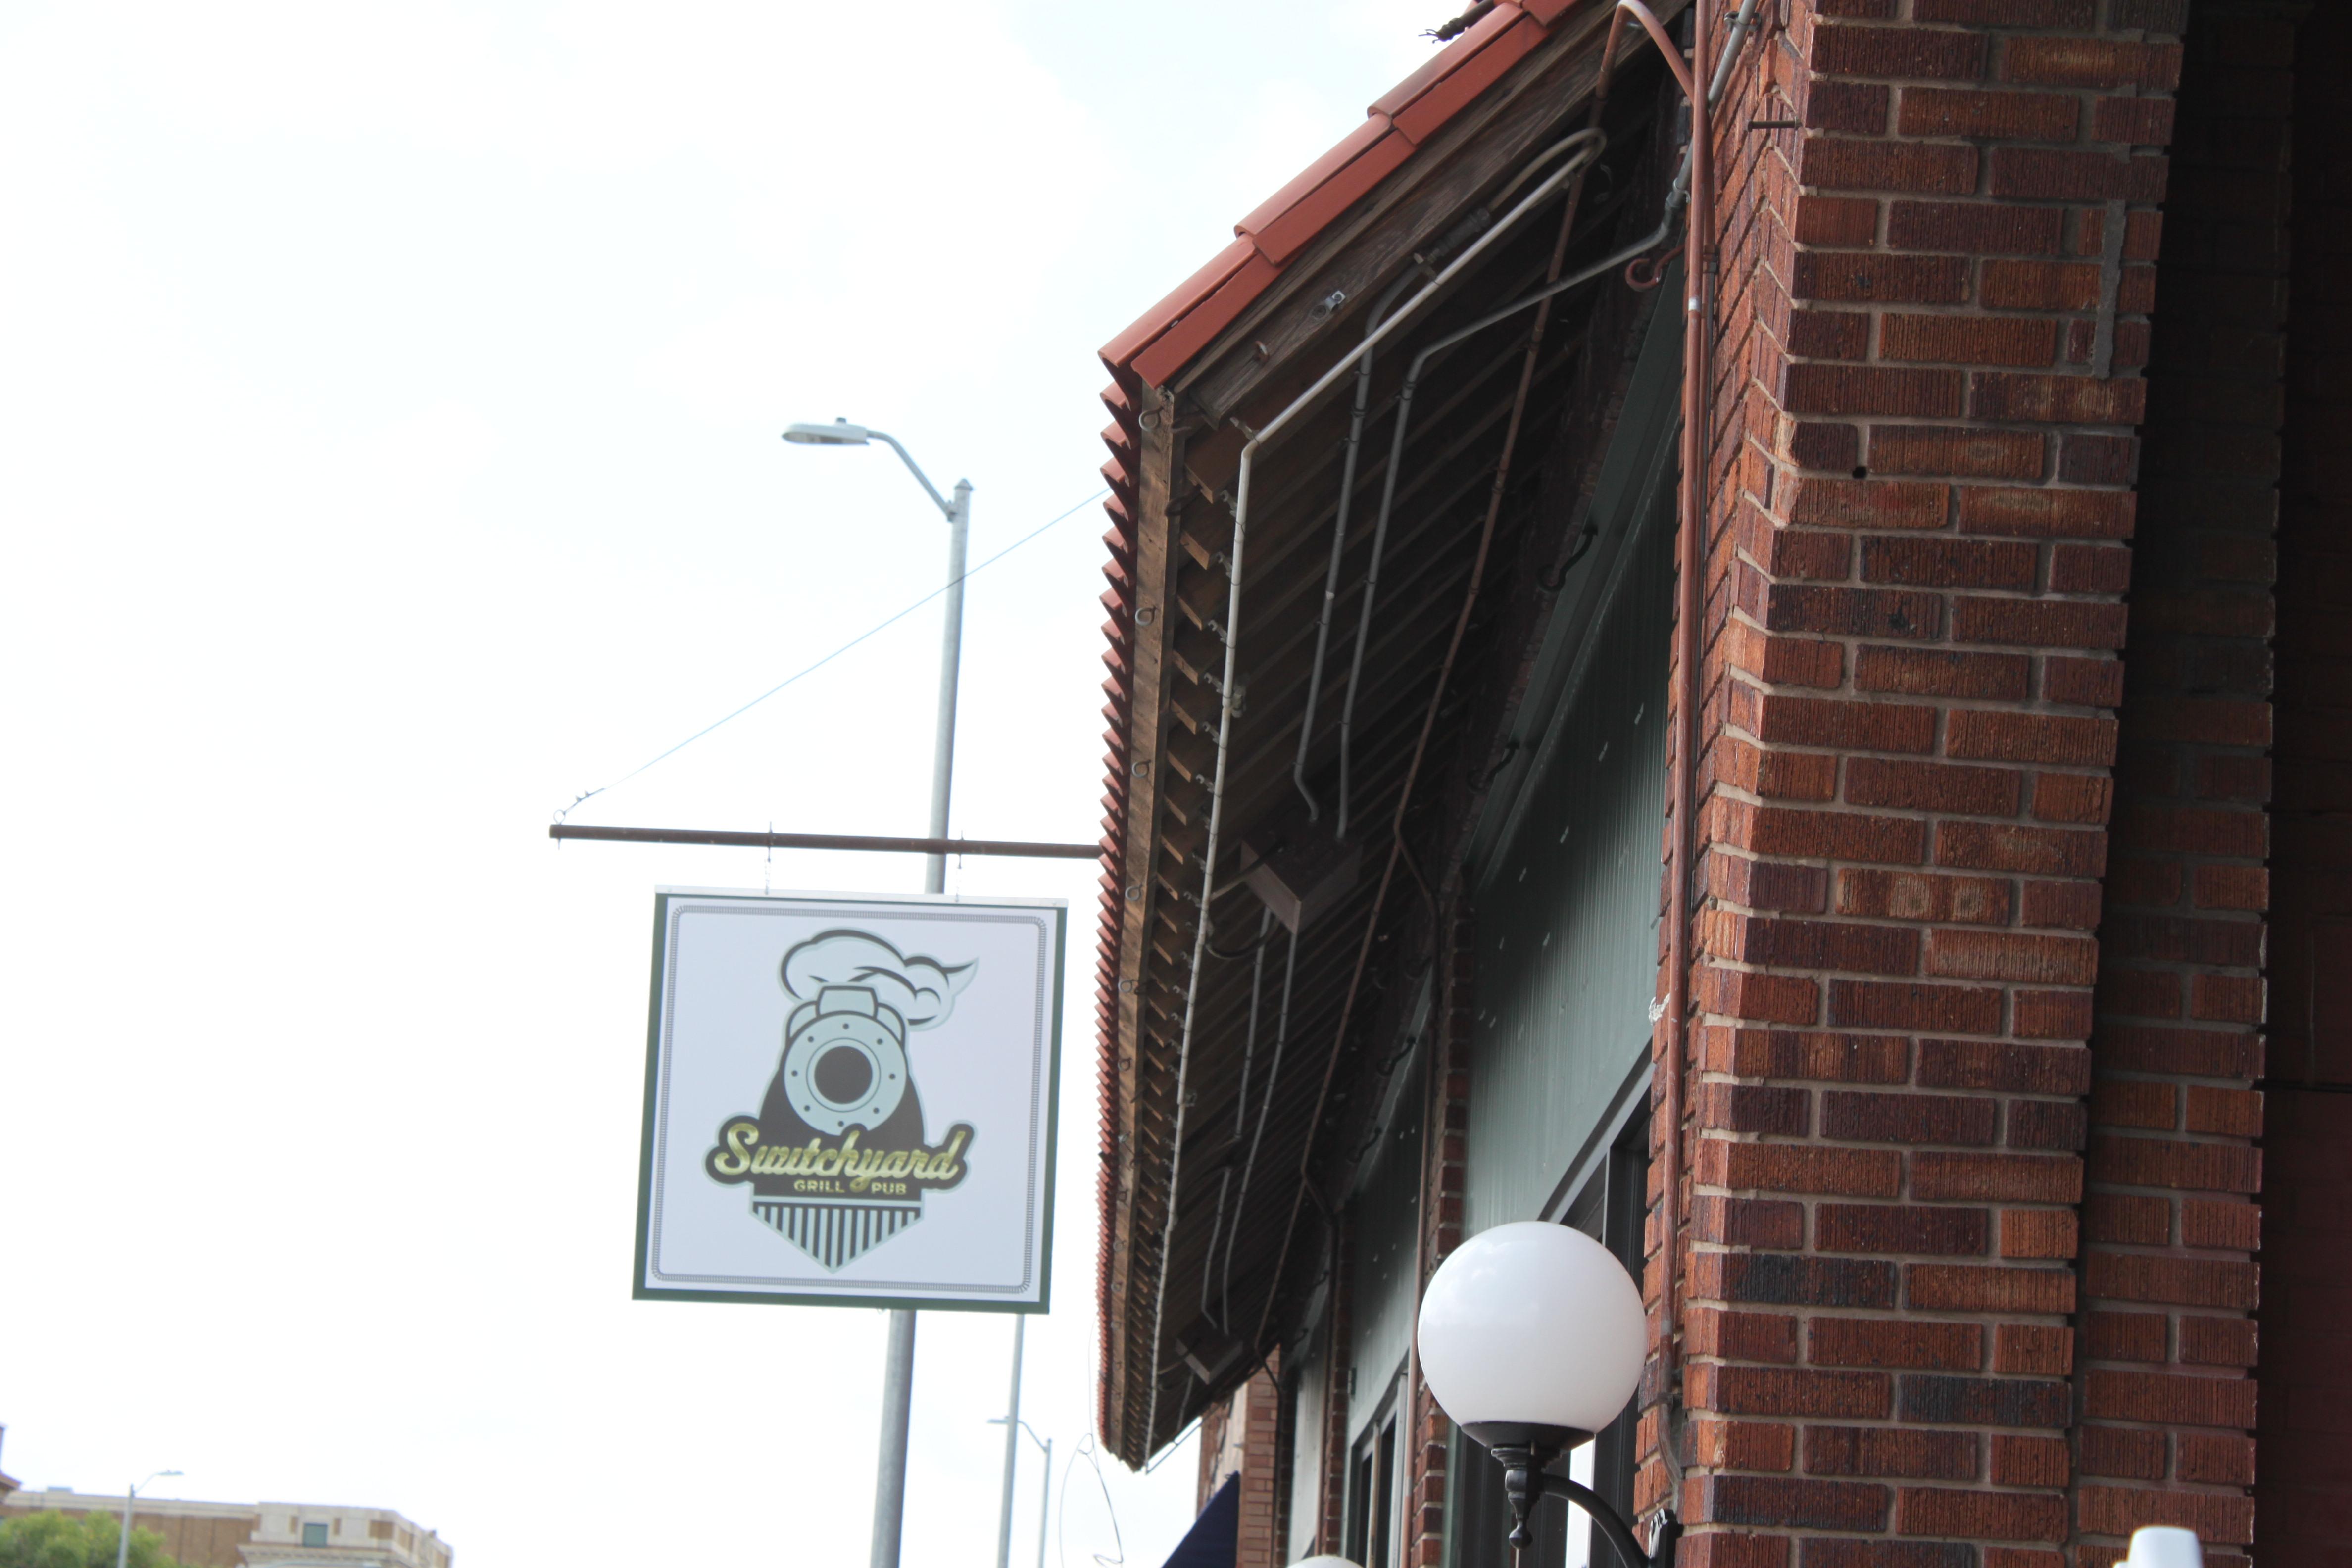 Switchyard Pub